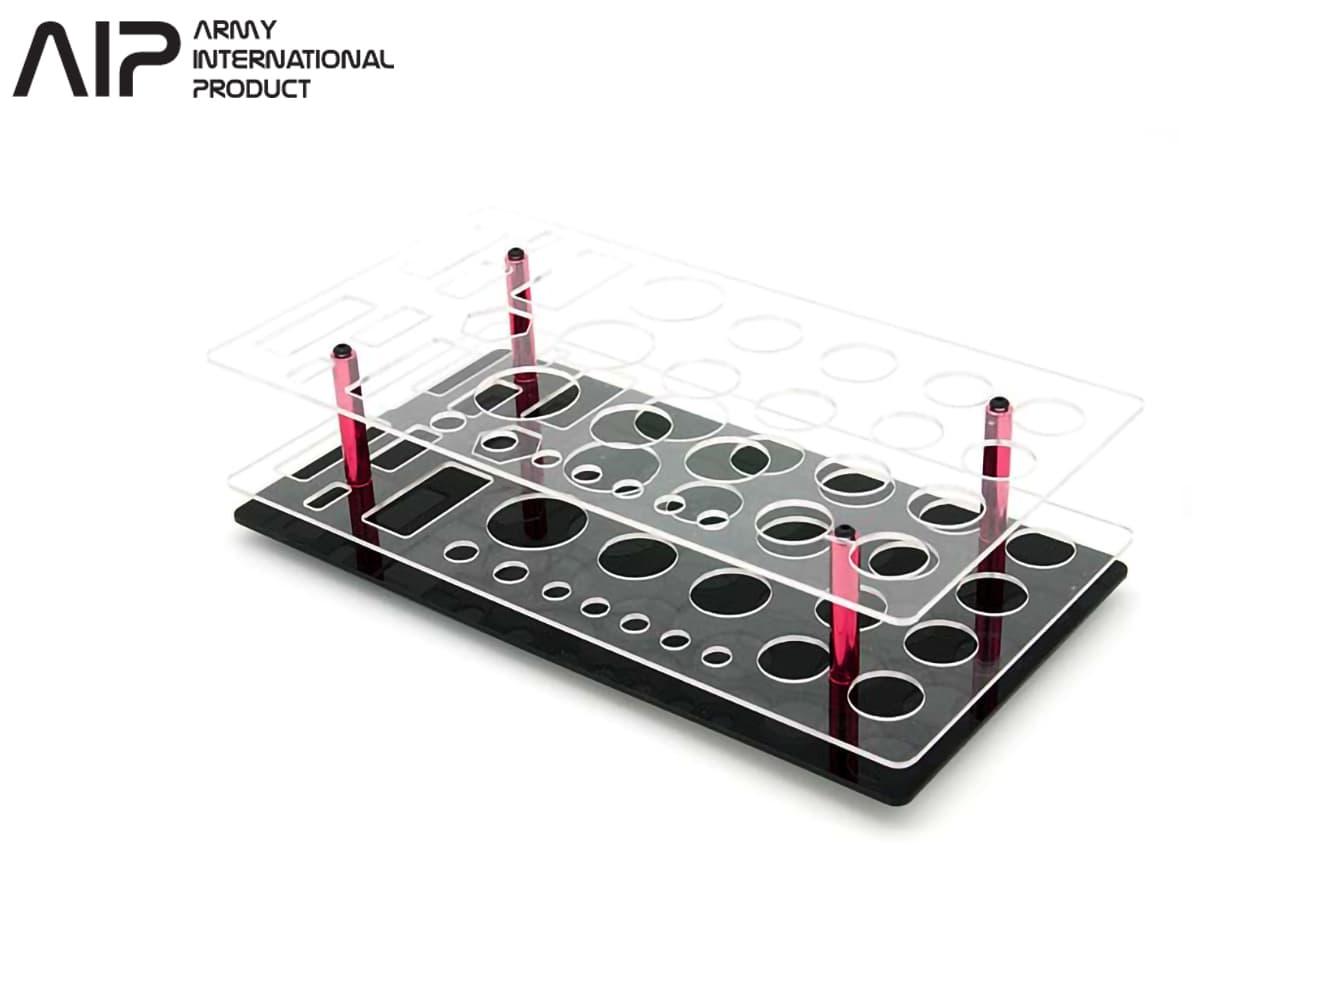 AIP アクリルツールスタンド◆トイガン 電動ガン 整備 工具立て ツールボックス ツールスタンド 工具箱 ガンの整備 ドライバー用スタンド